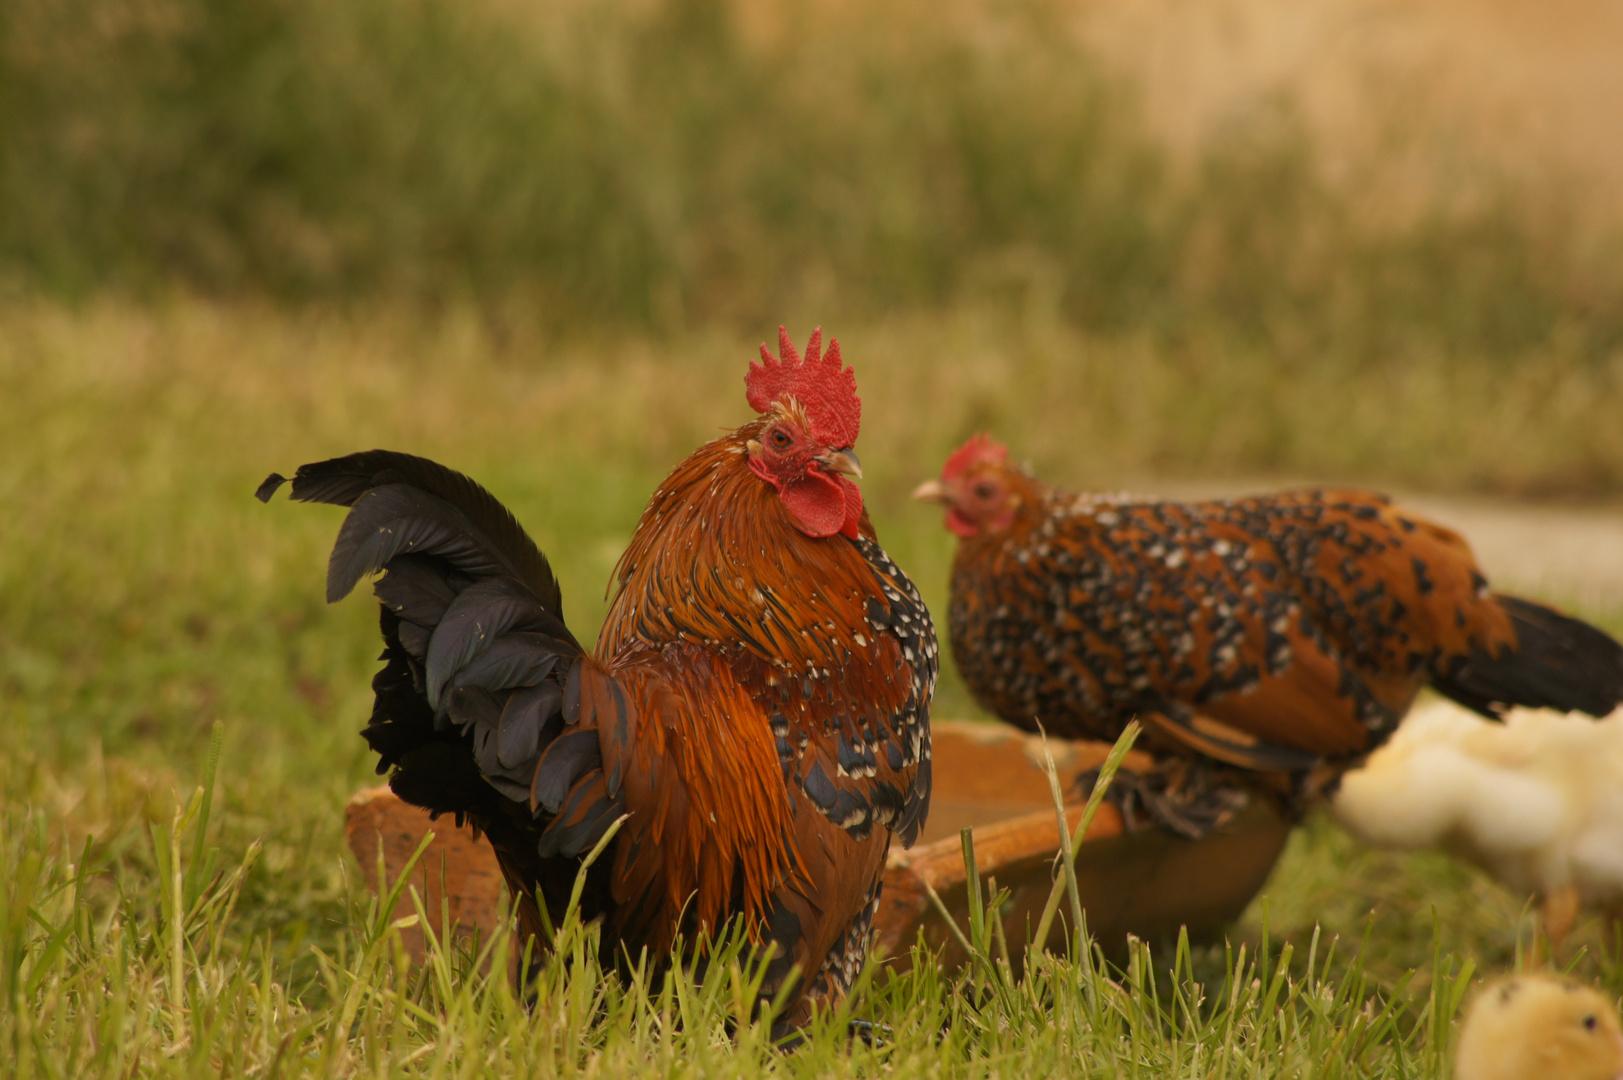 Federfüßige Zwerghühner goldporzelanfarbig